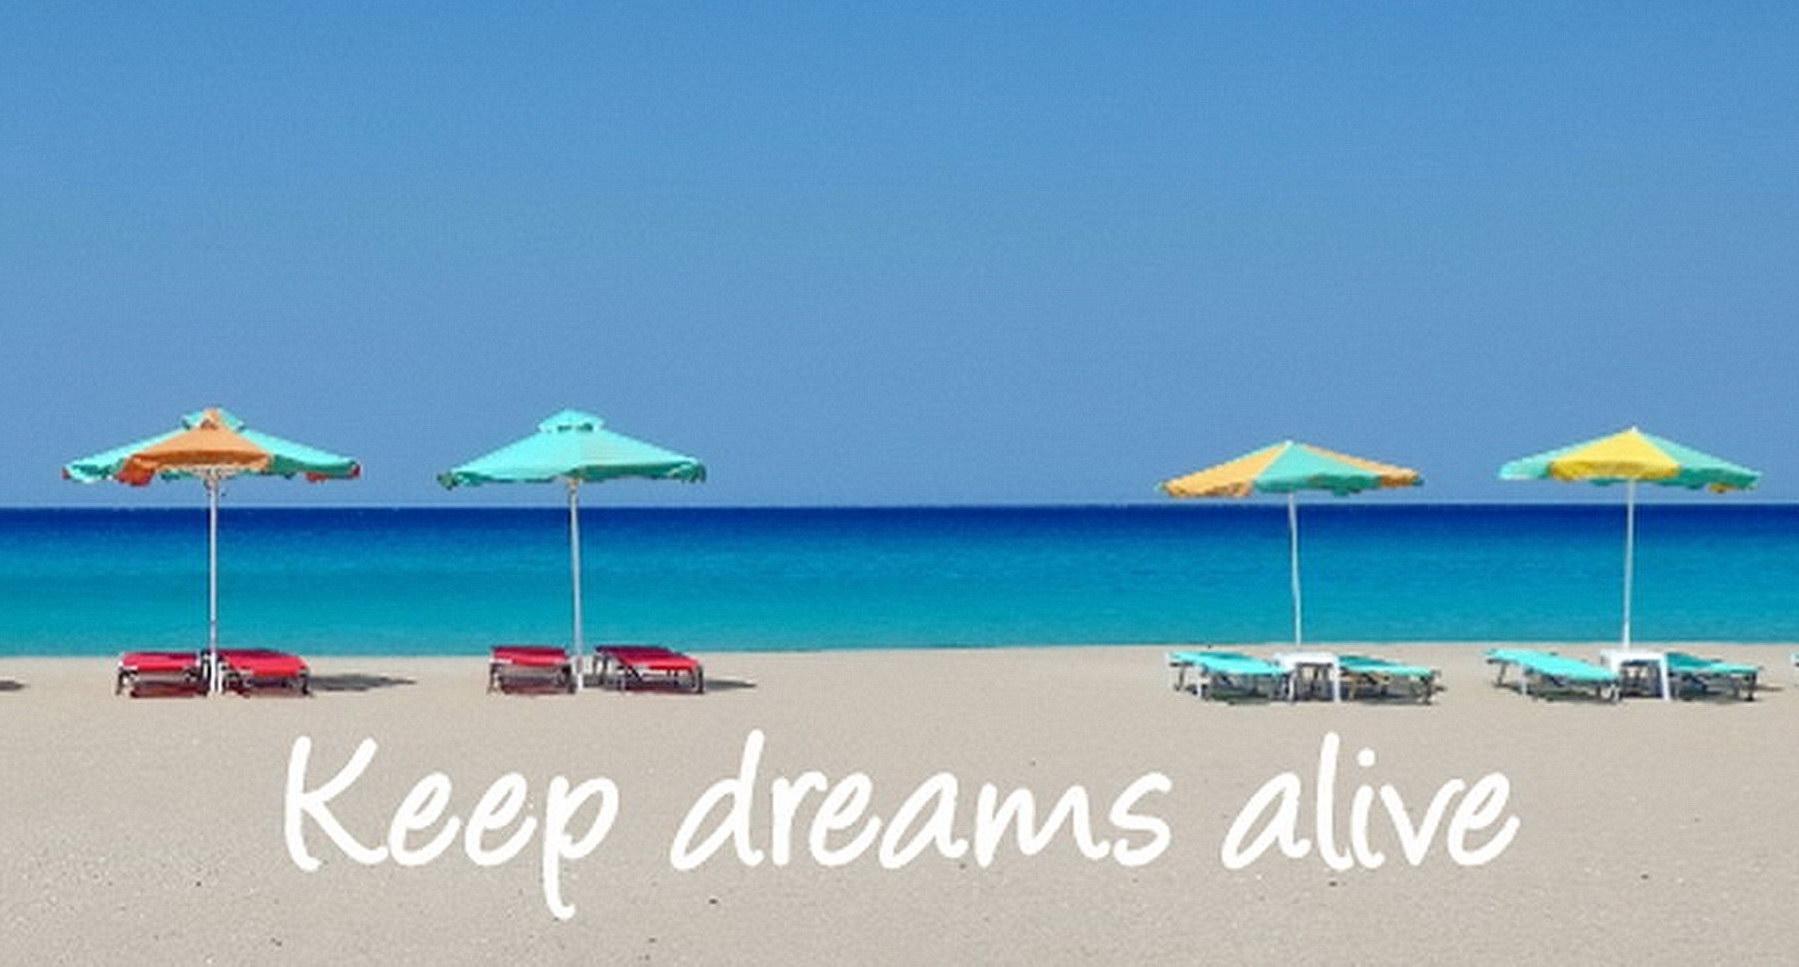 forside-keep-dreams-alive.illu-2.jpg